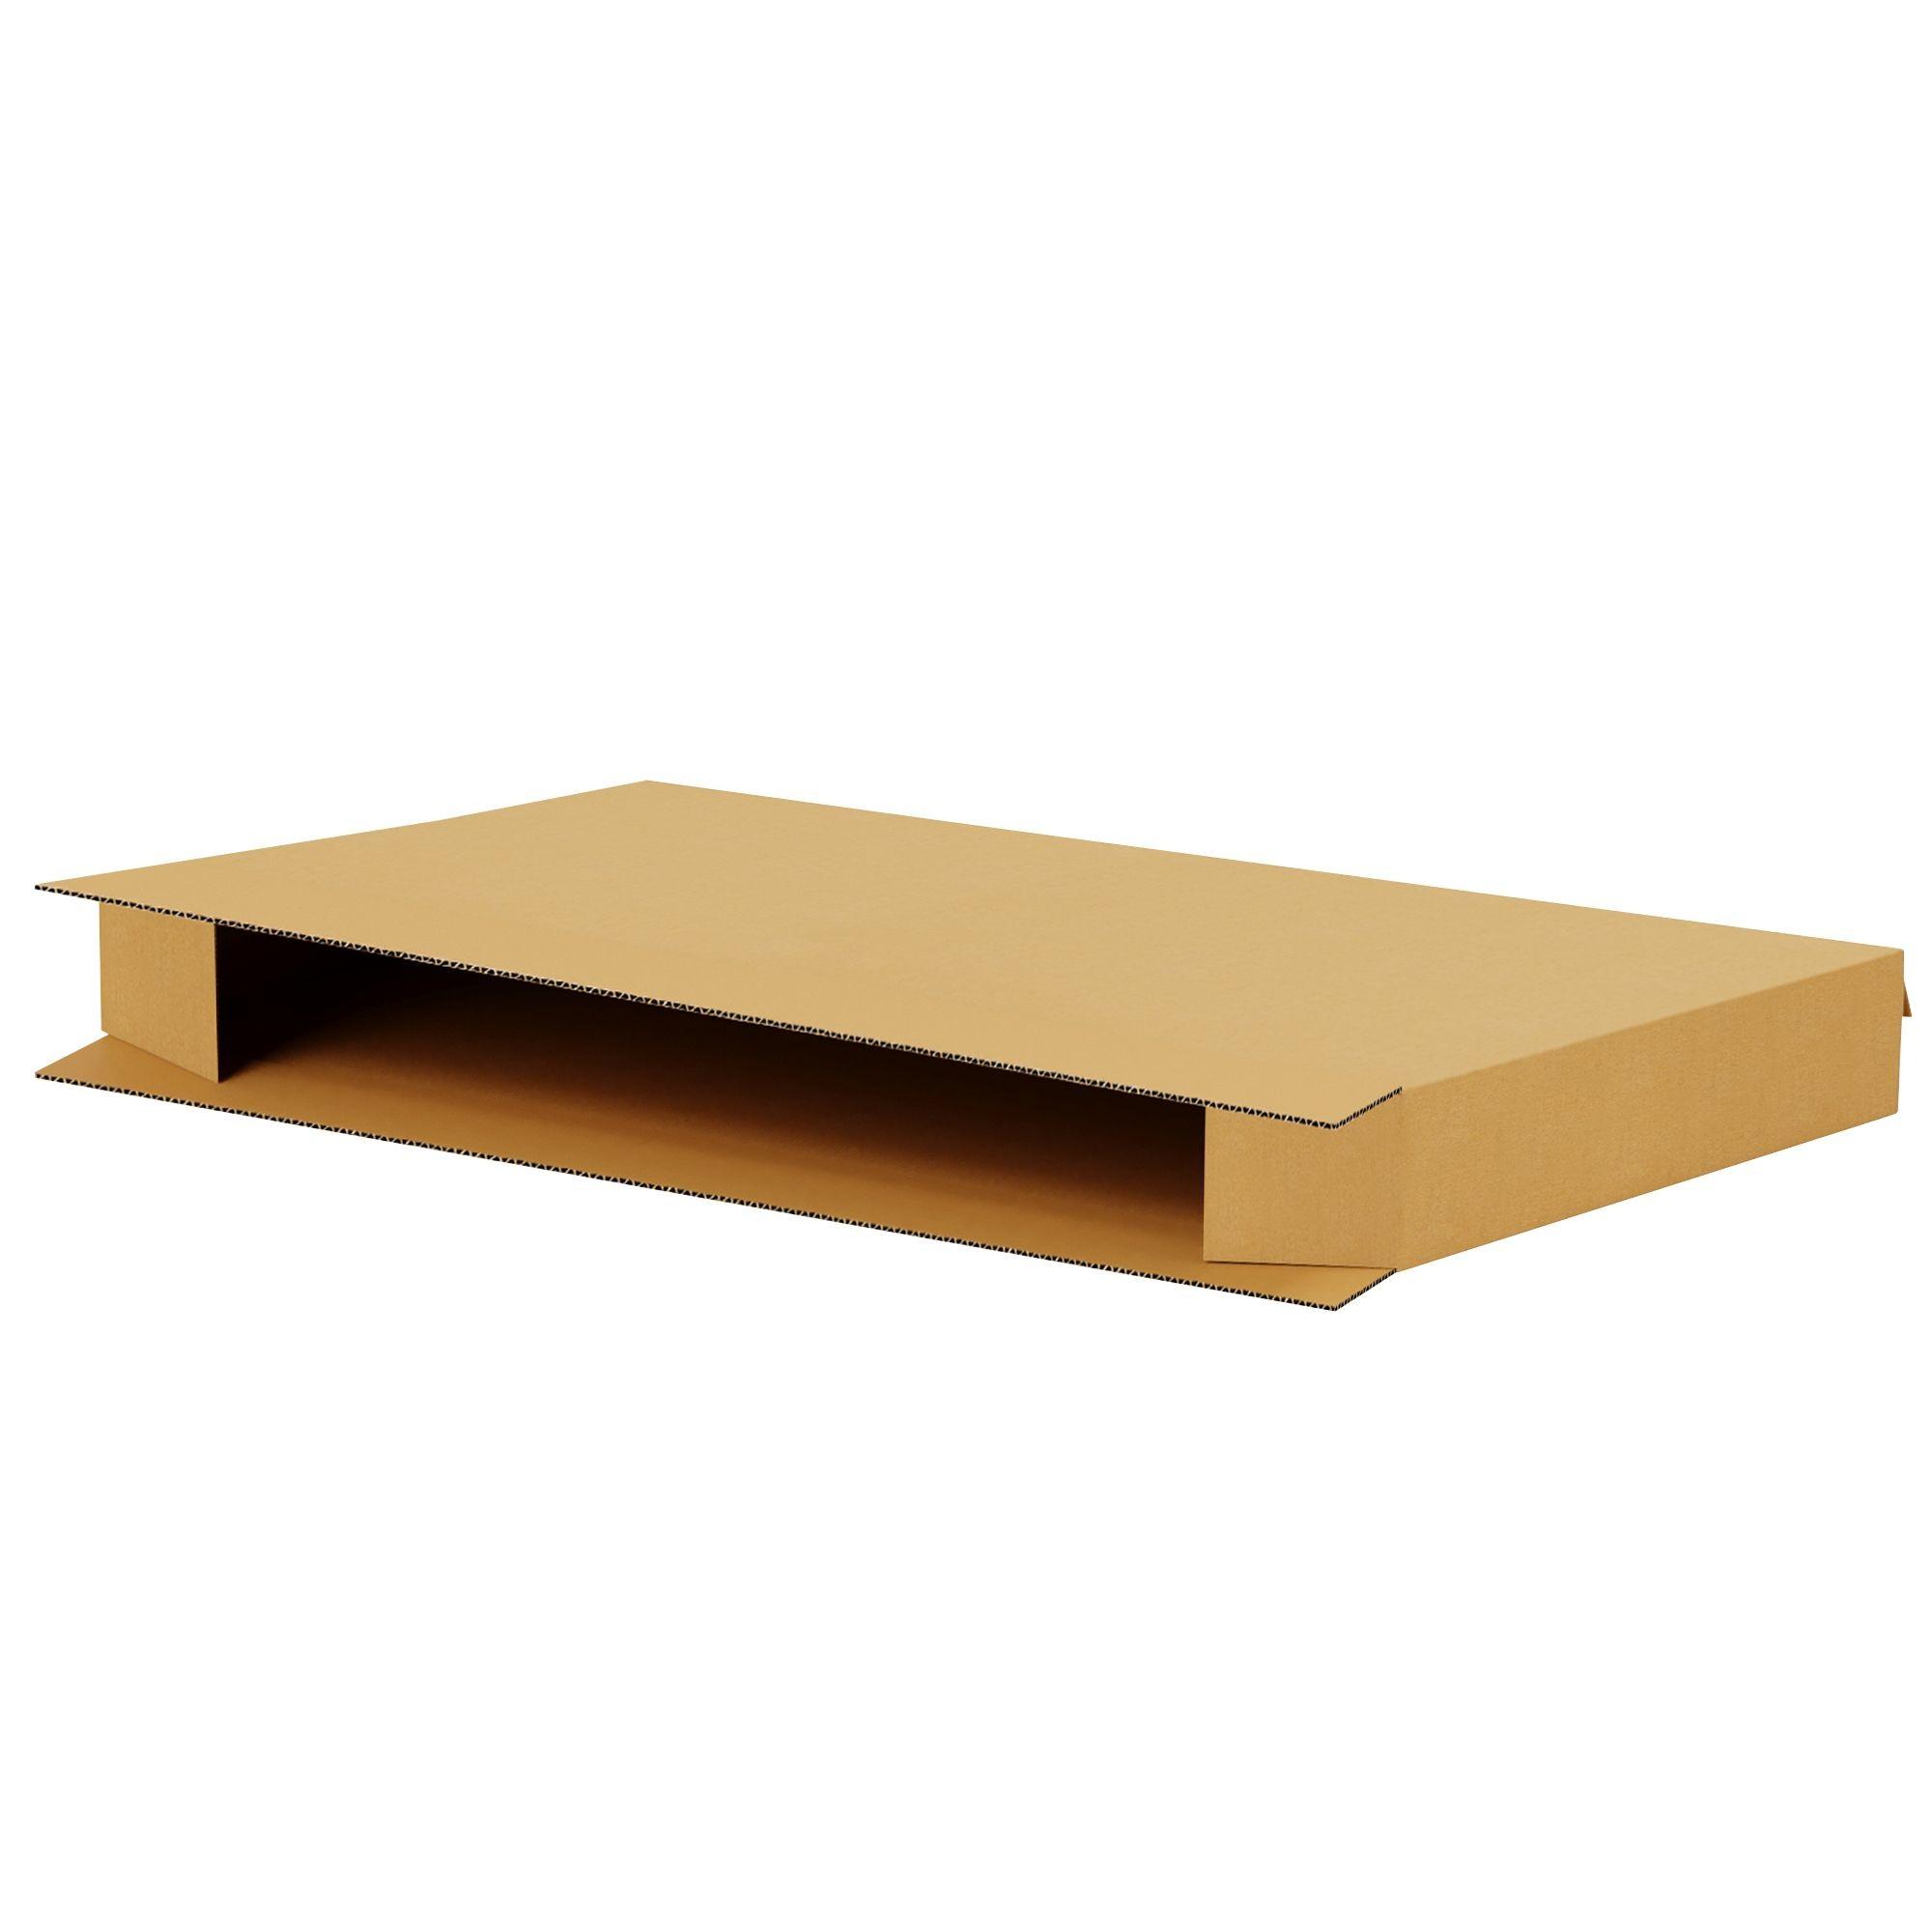 "TOTALPACK® 39 1/2 x 8 1/2 x 75 1/8"" Twin Mattress Corrugated Boxes 5 Unit"